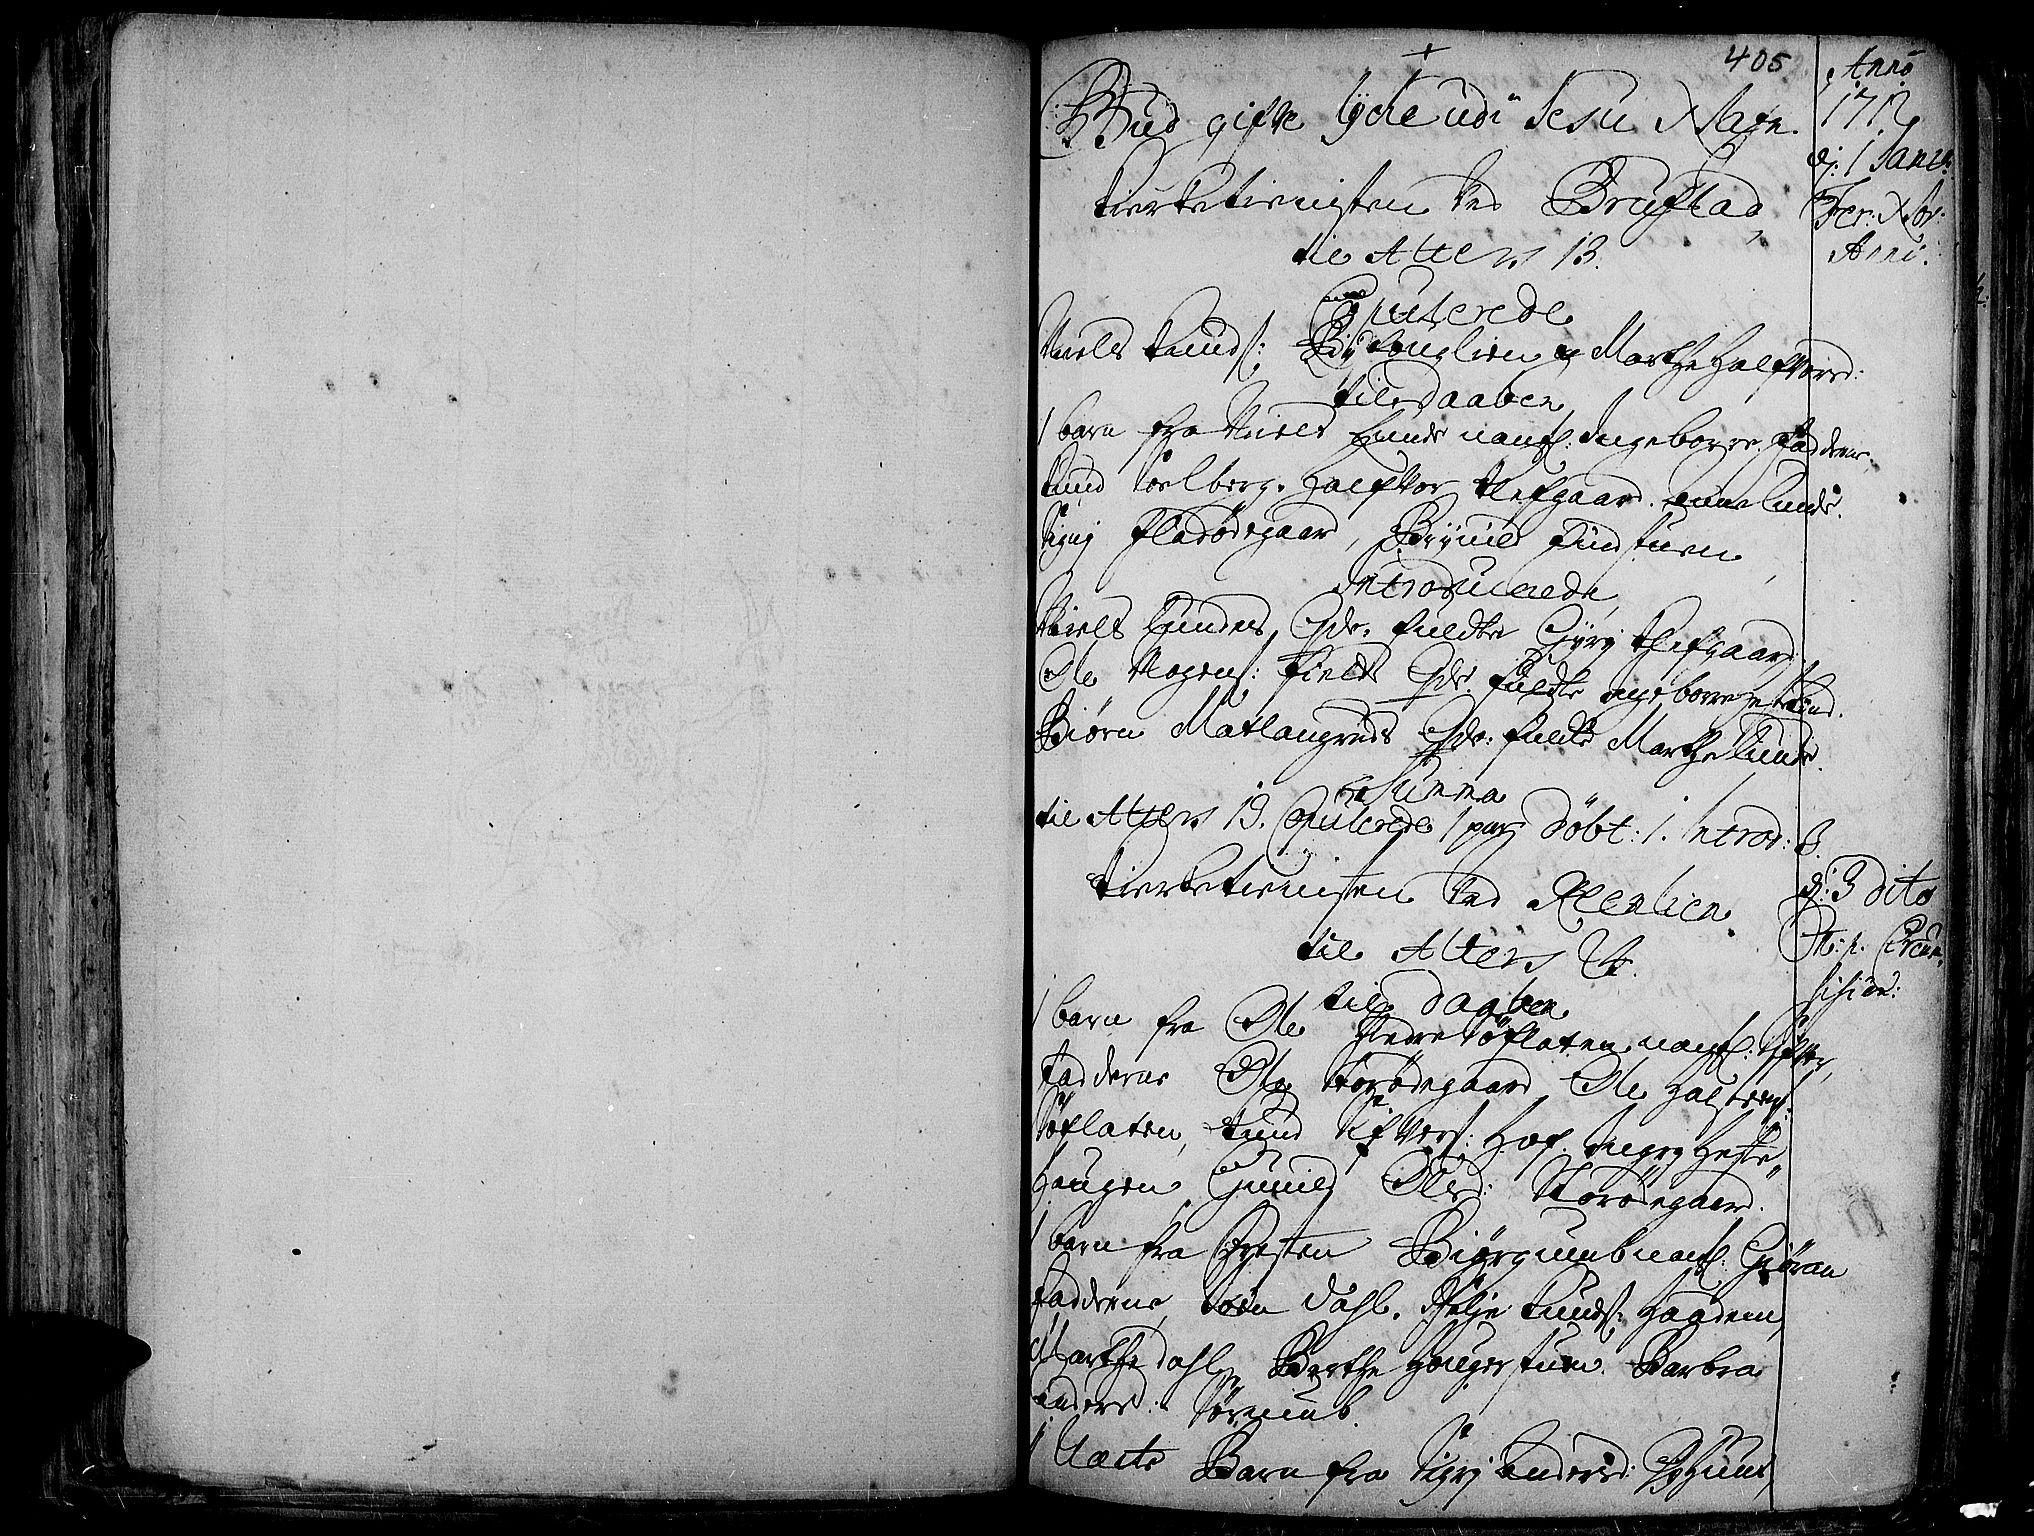 SAH, Aurdal prestekontor, Ministerialbok nr. 1-3, 1692-1730, s. 405